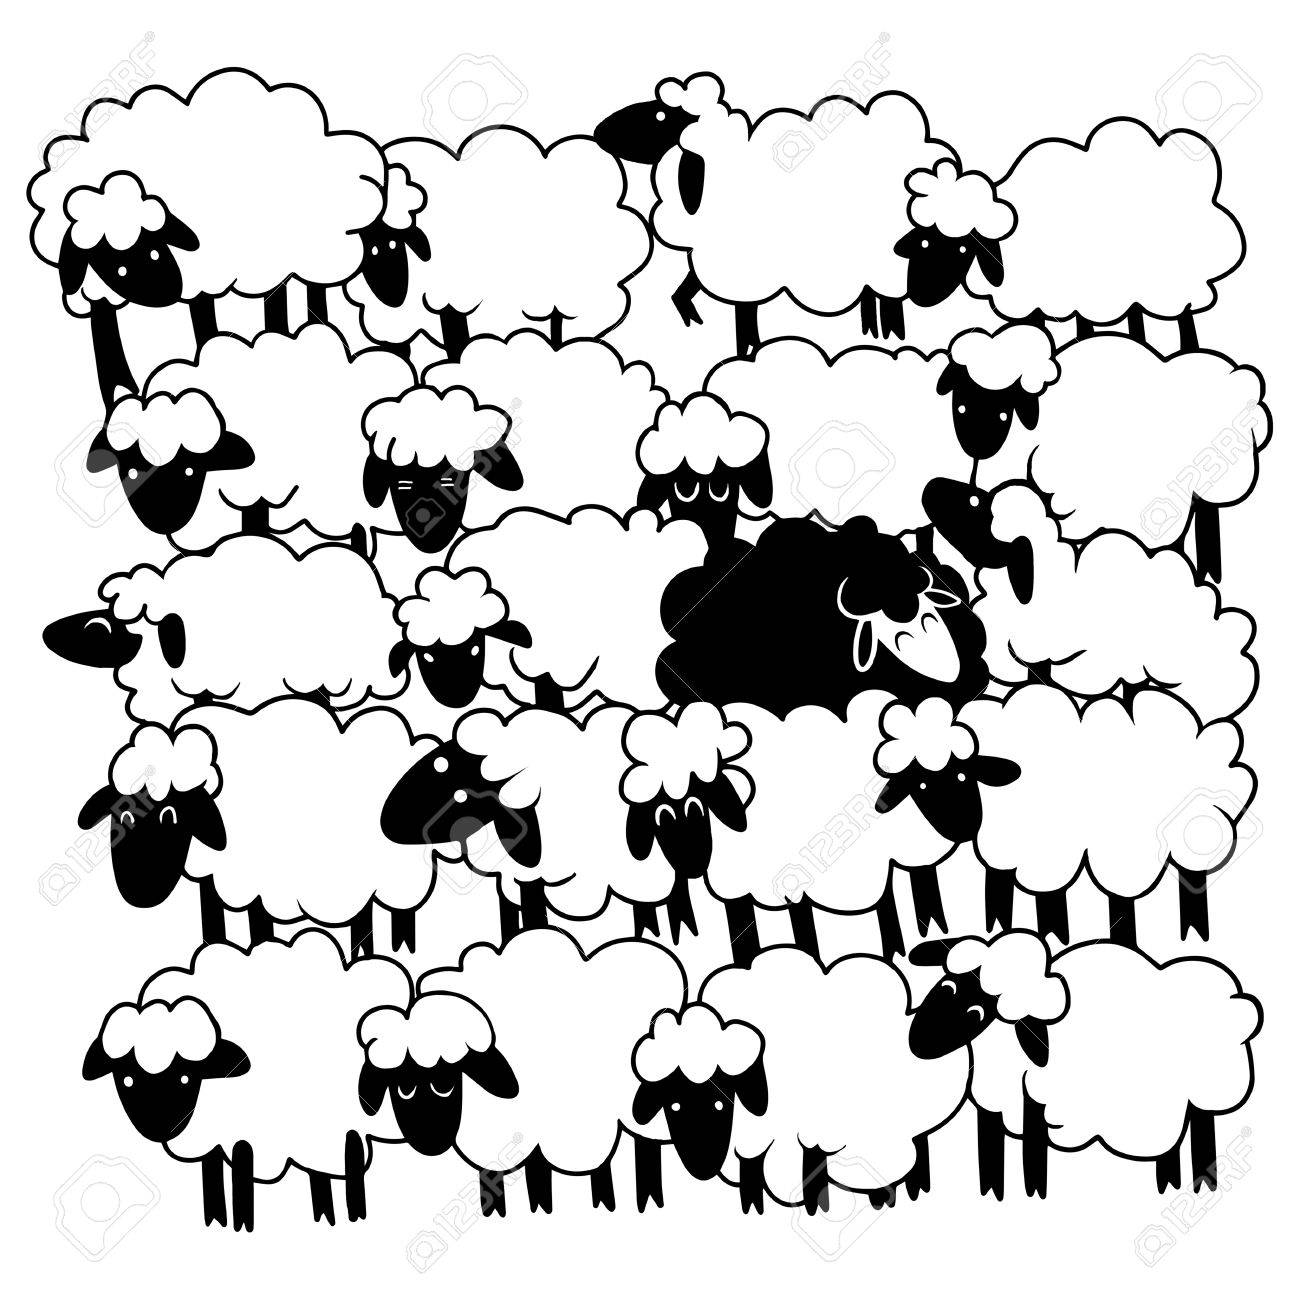 1300x1300 Black Sheep Amongst White Sheep ,single Black Sheep In White